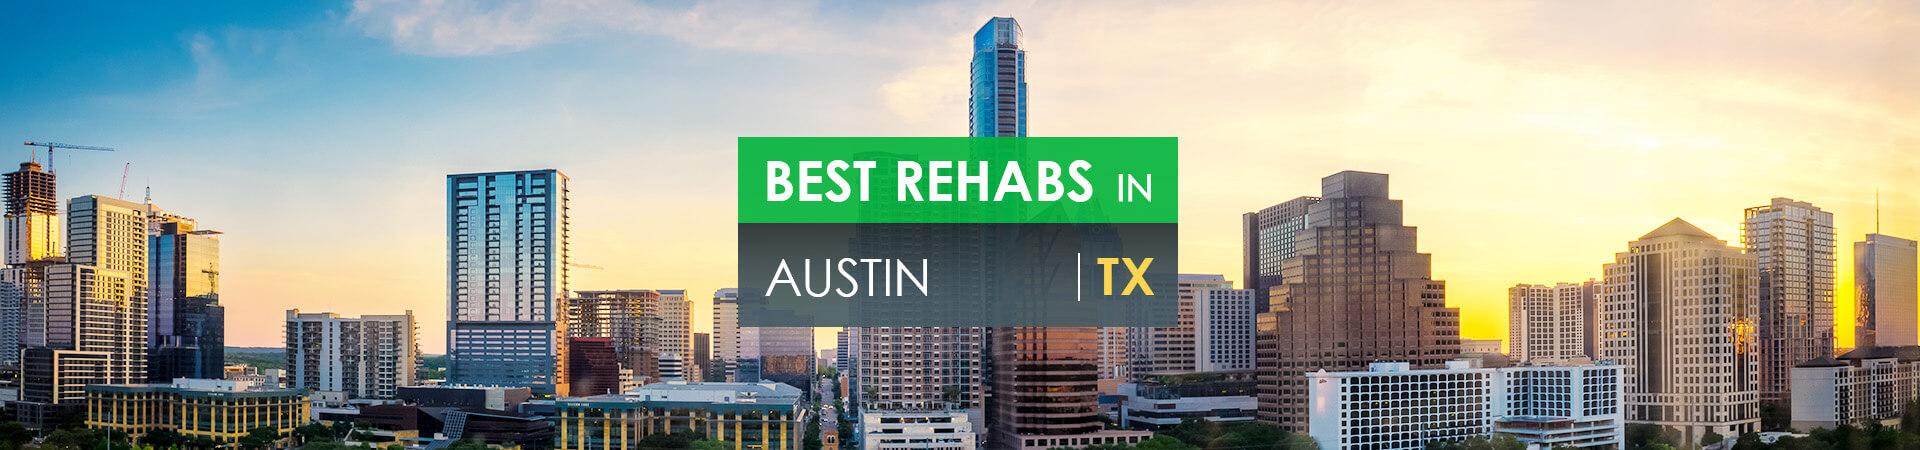 Best rehabs in Austin, TX